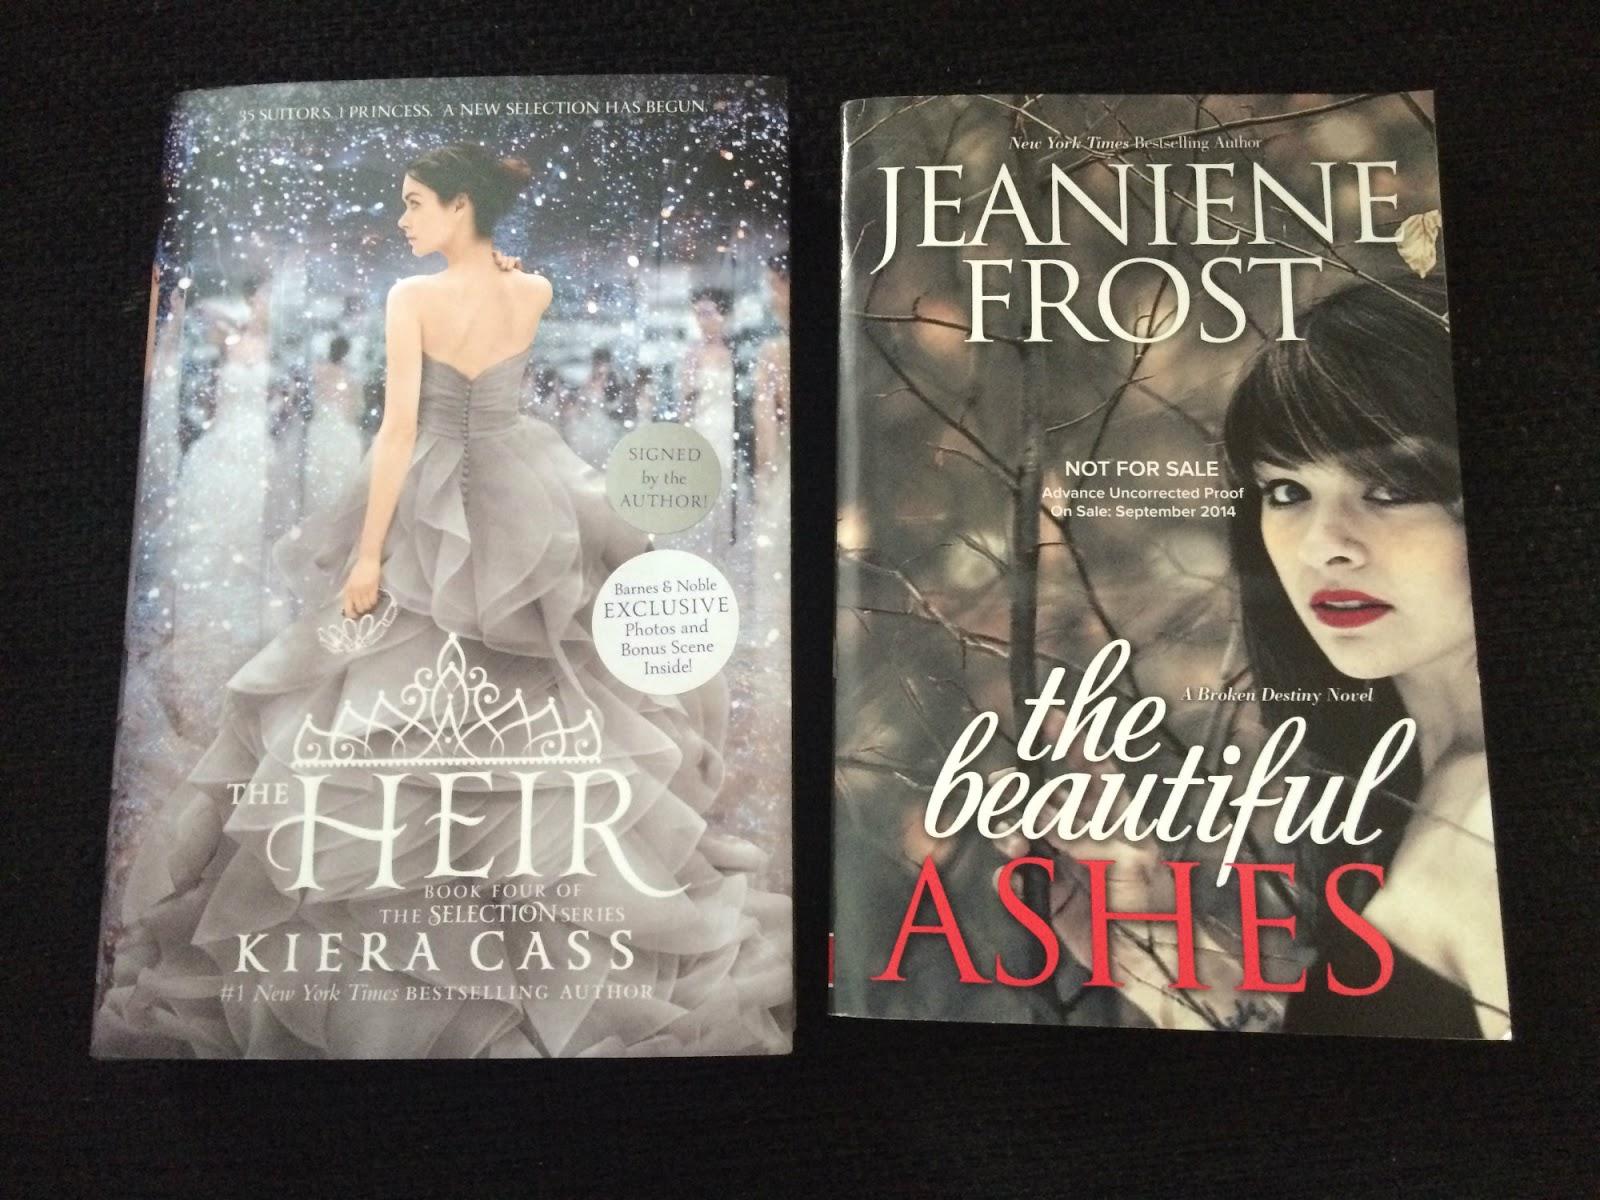 The Beautiful Ashes (broken Destiny #1) By Jeaniene Frost